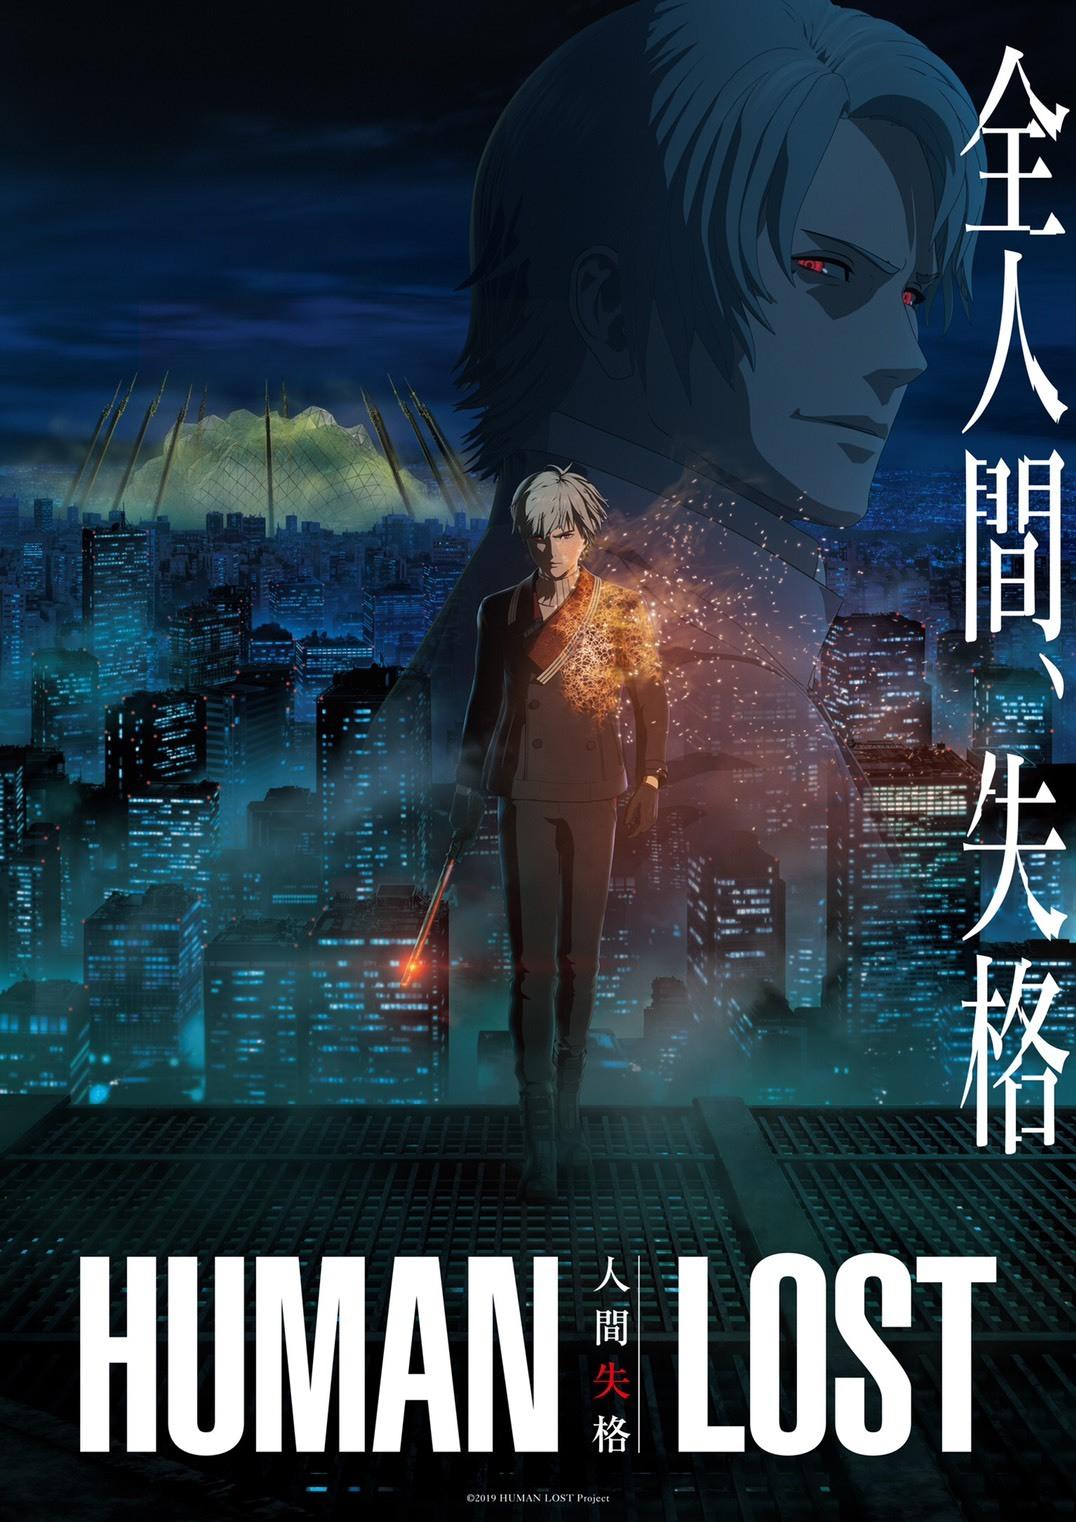 『HUMAN LOST 人間失格』キービジュアル (C)2019 HUMAN LOST Project